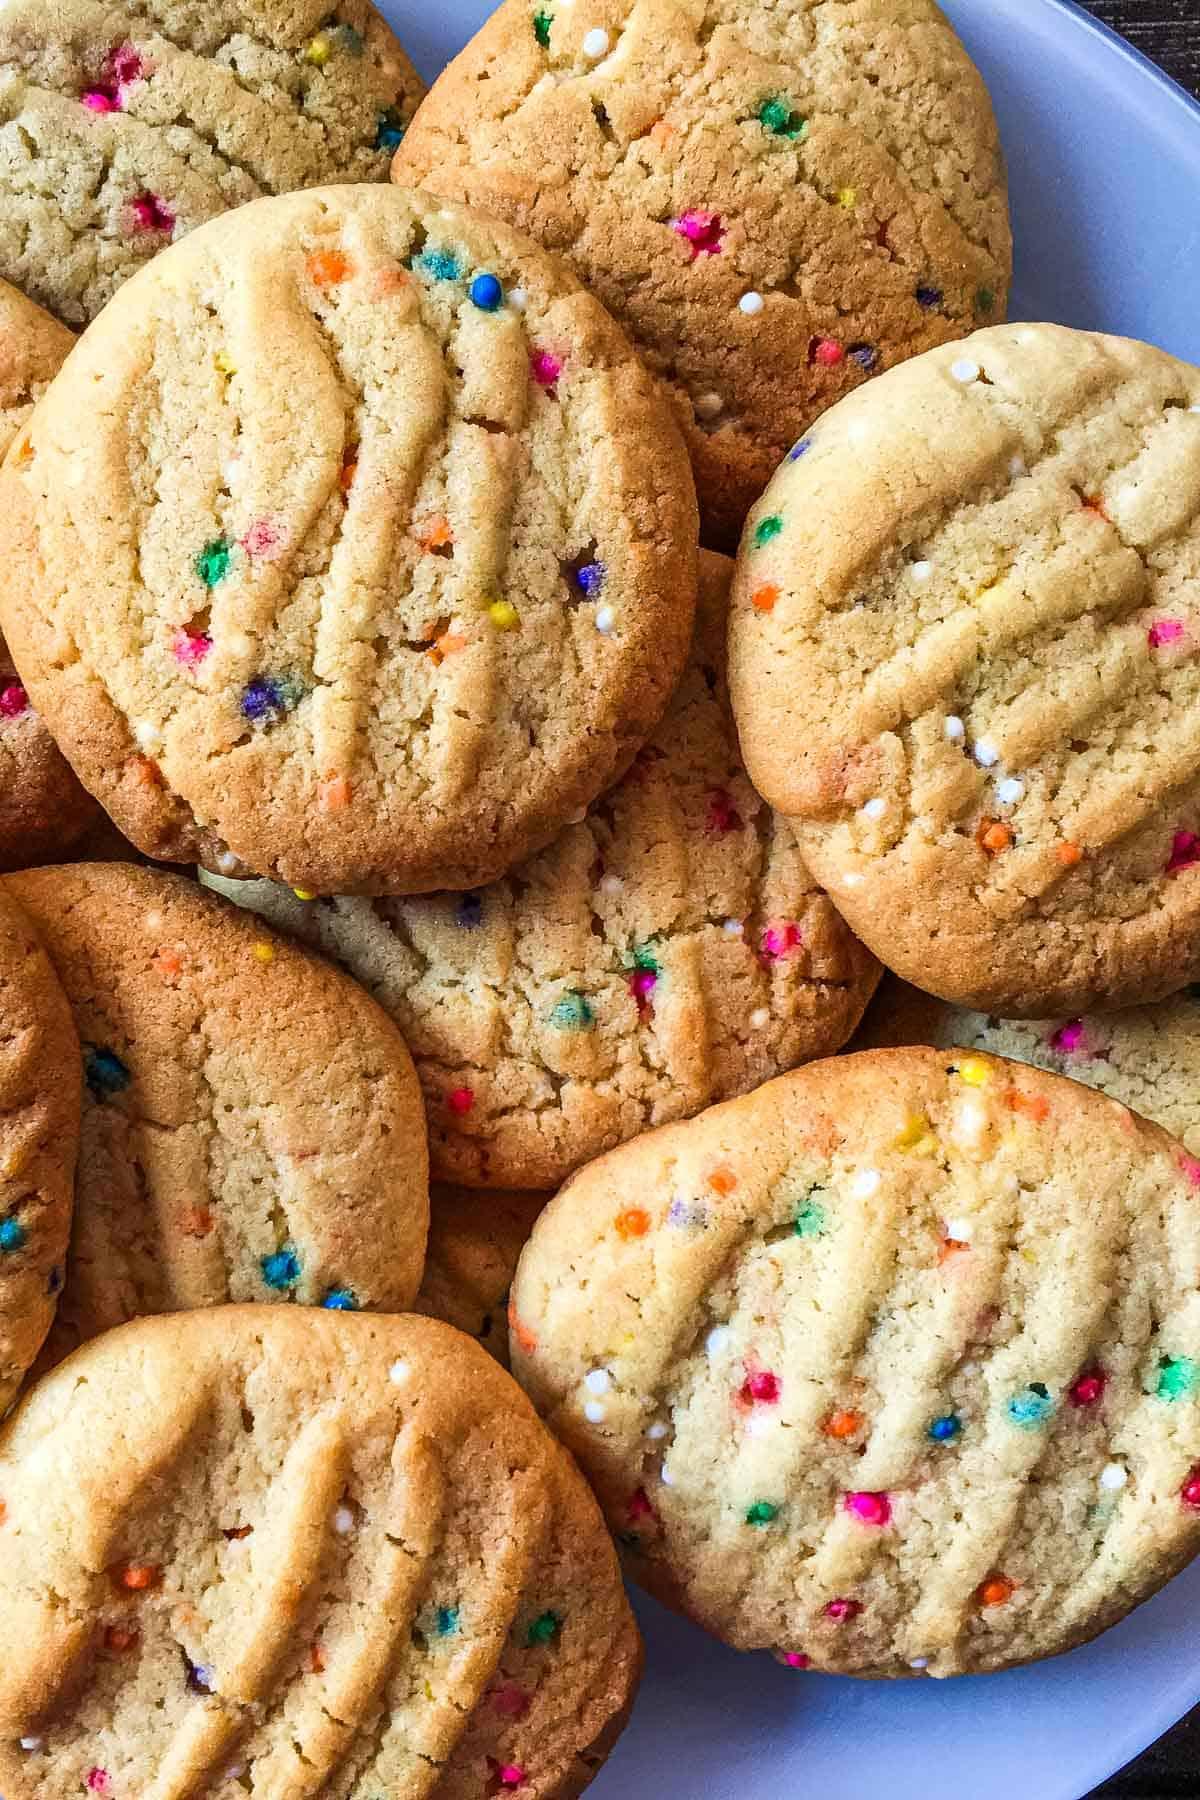 Round cookies with sprinkles